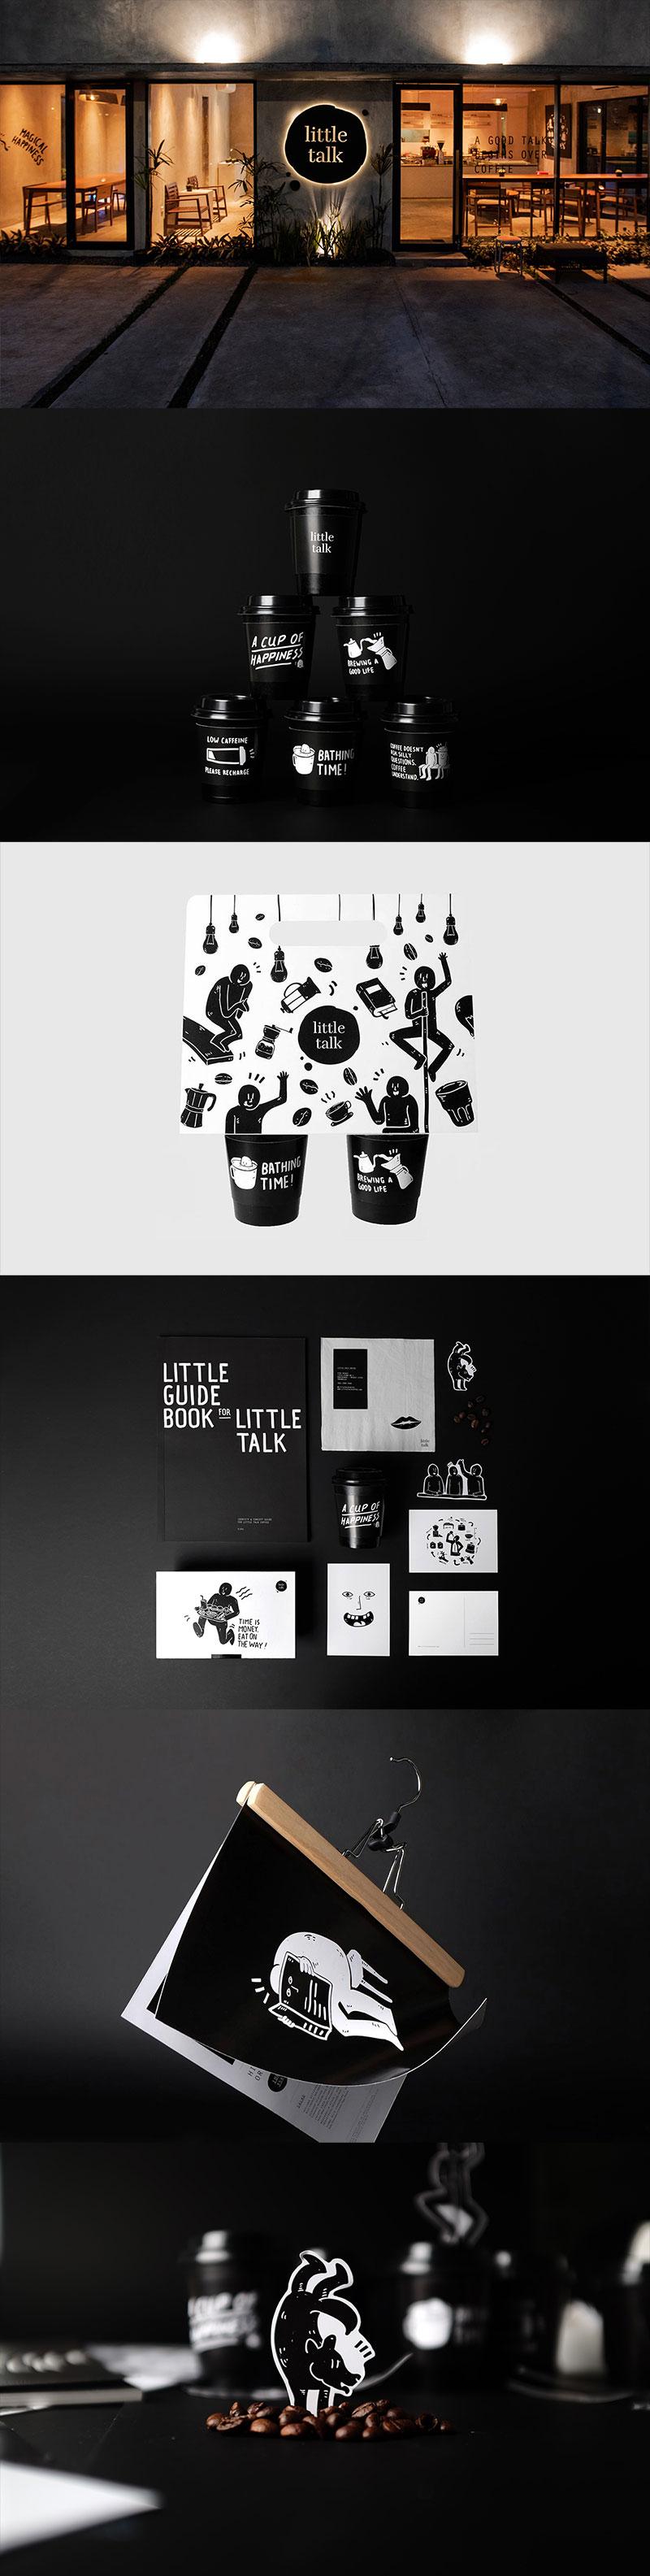 Little Talk by Sciencewerk